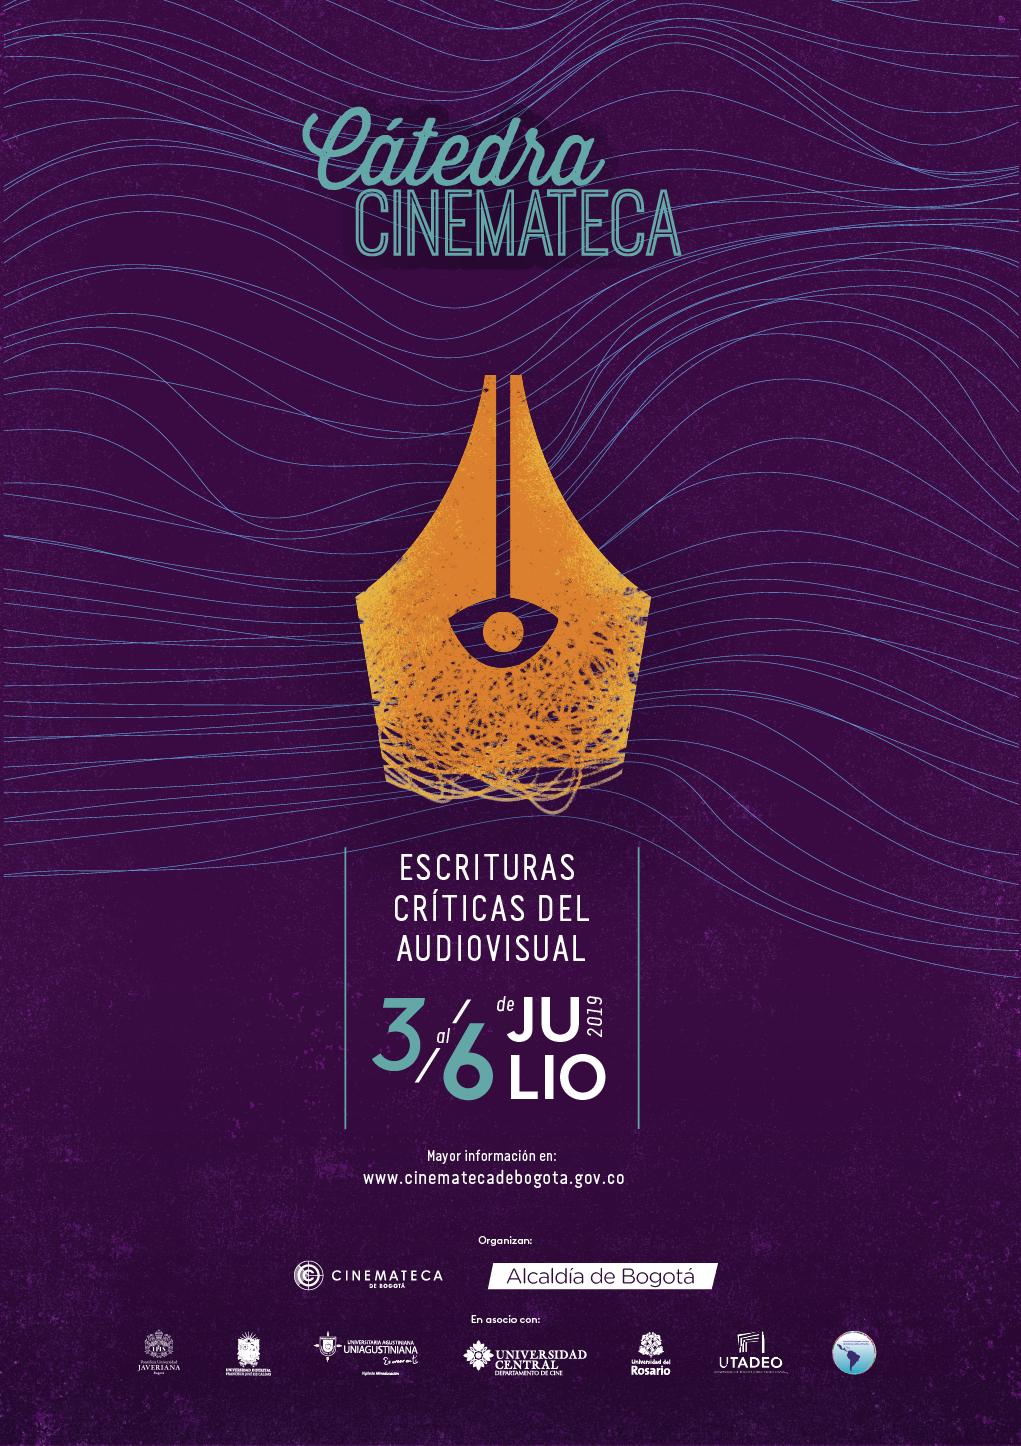 afiche_catedra_cinemateca.png